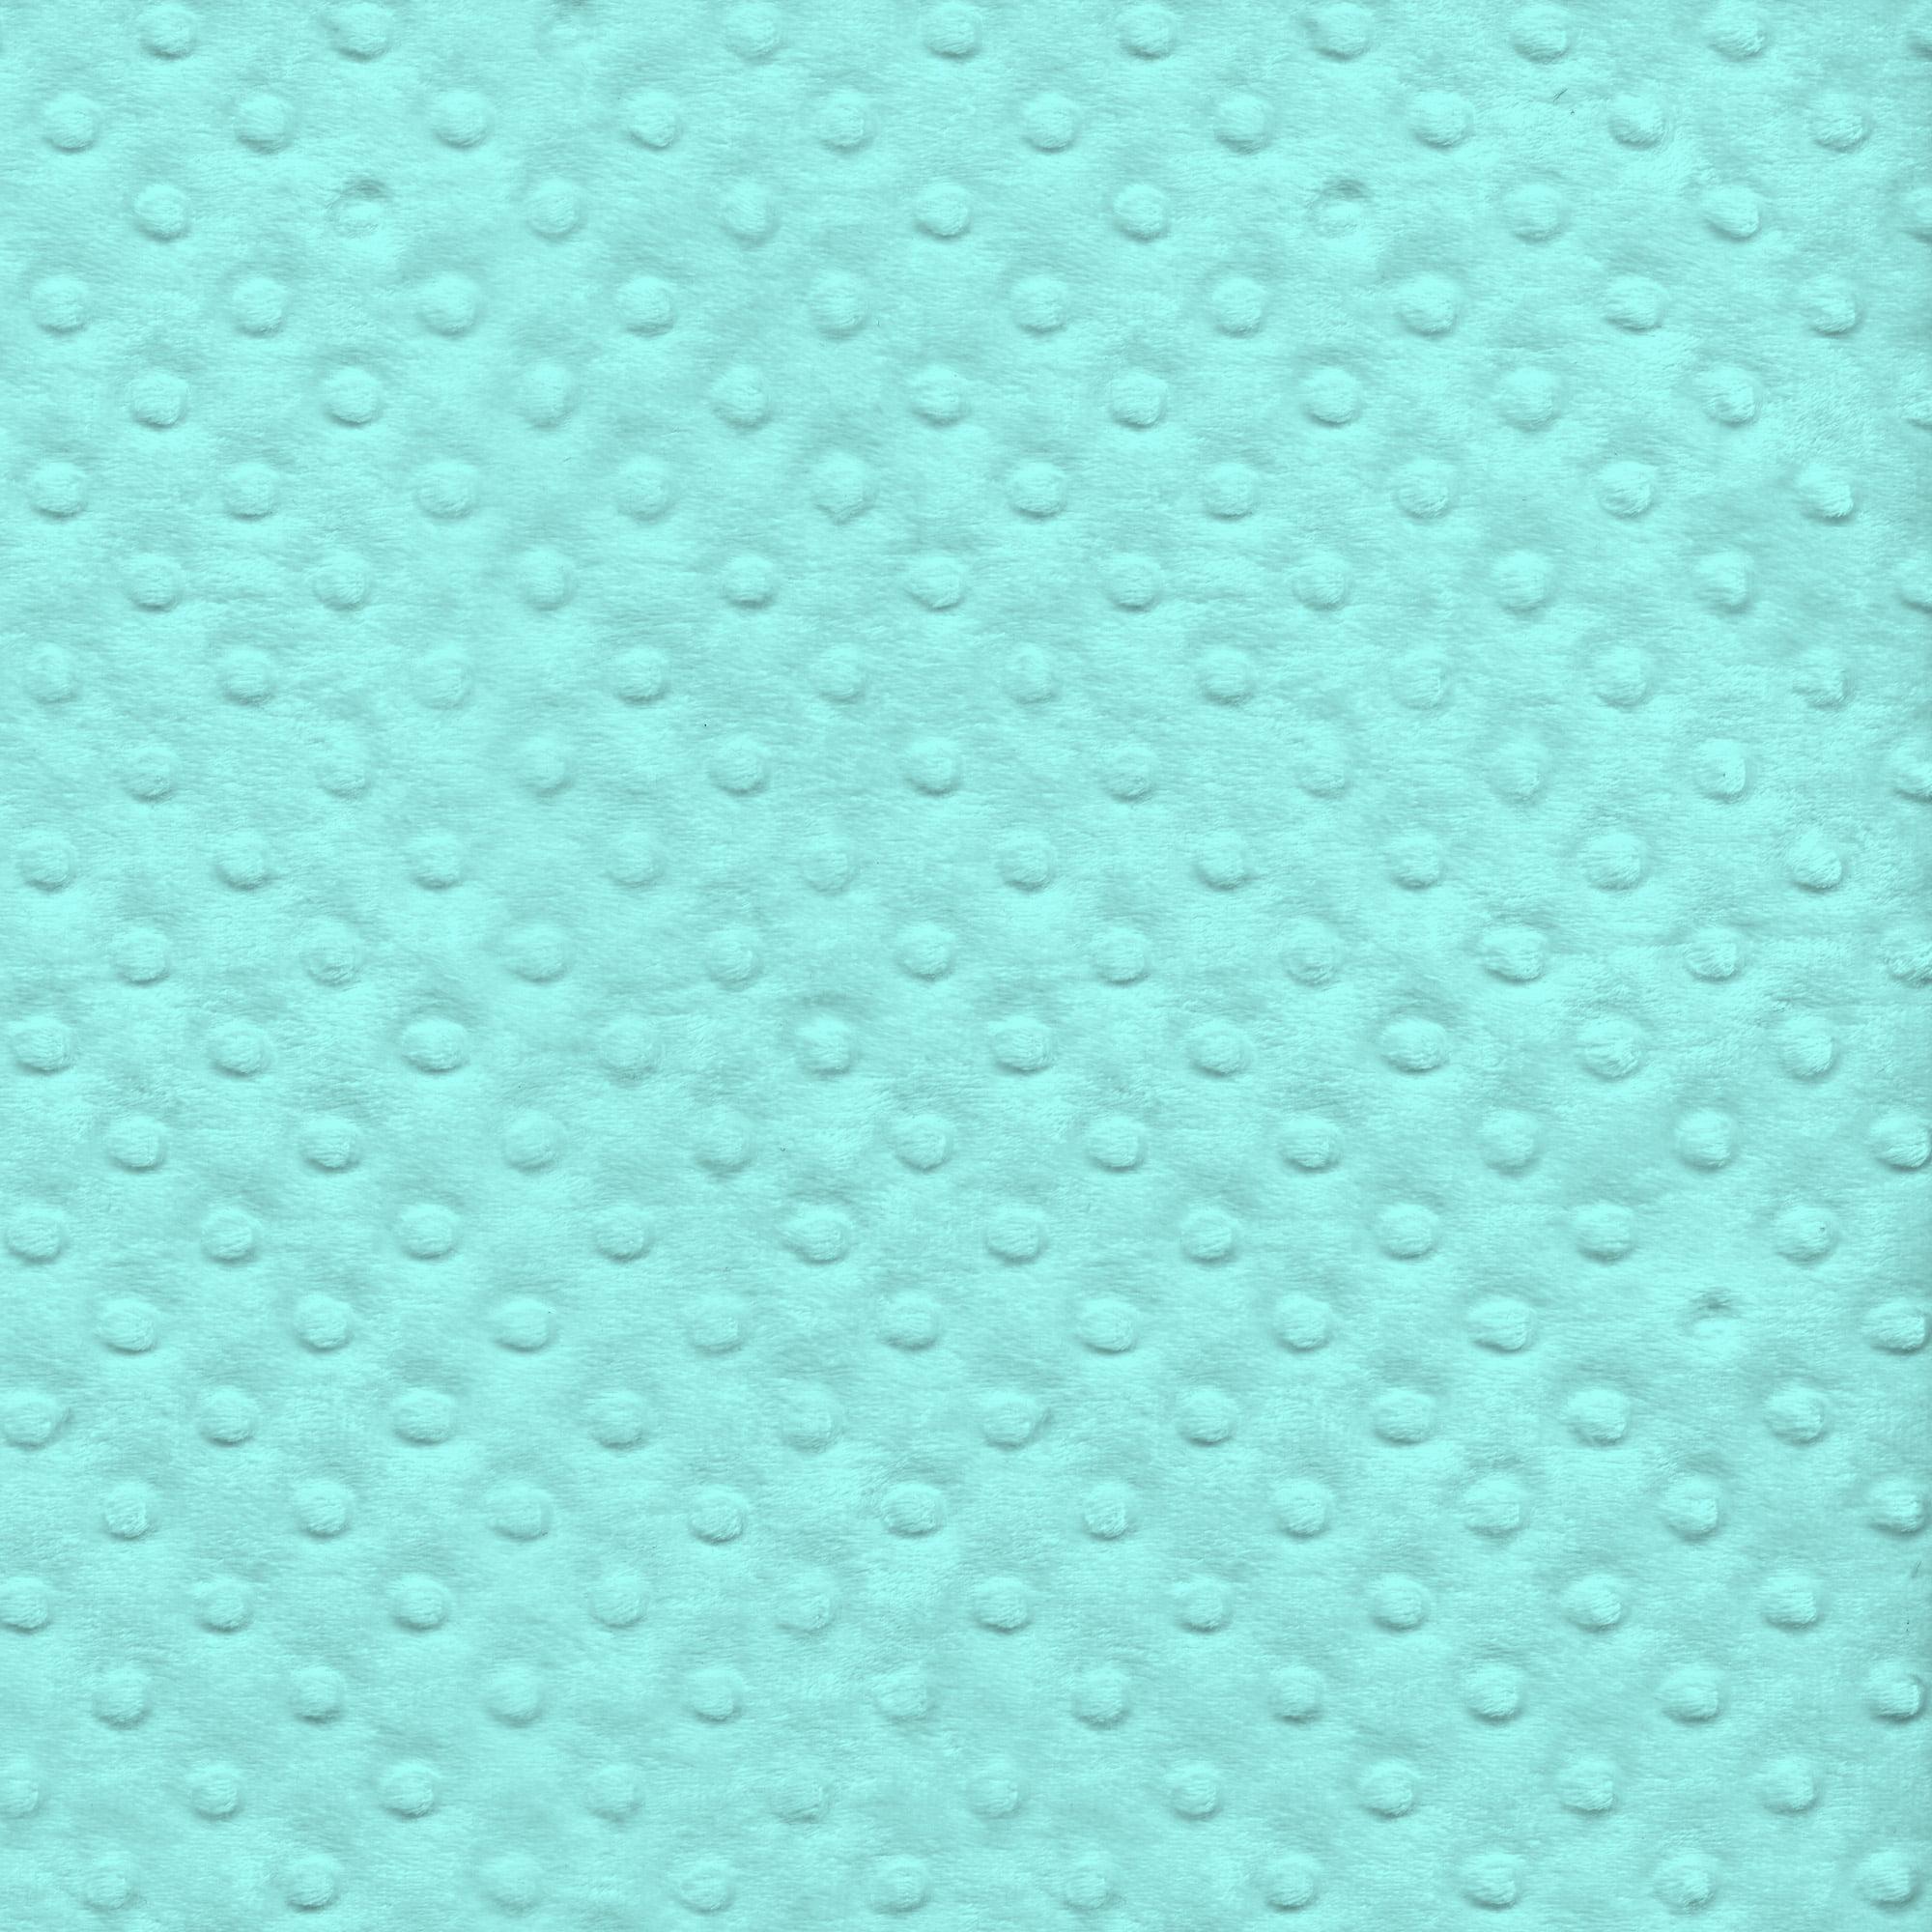 "David Textiles Polyester Fleece Plush 36"" x 60"" Dot Fabric, per Yard"